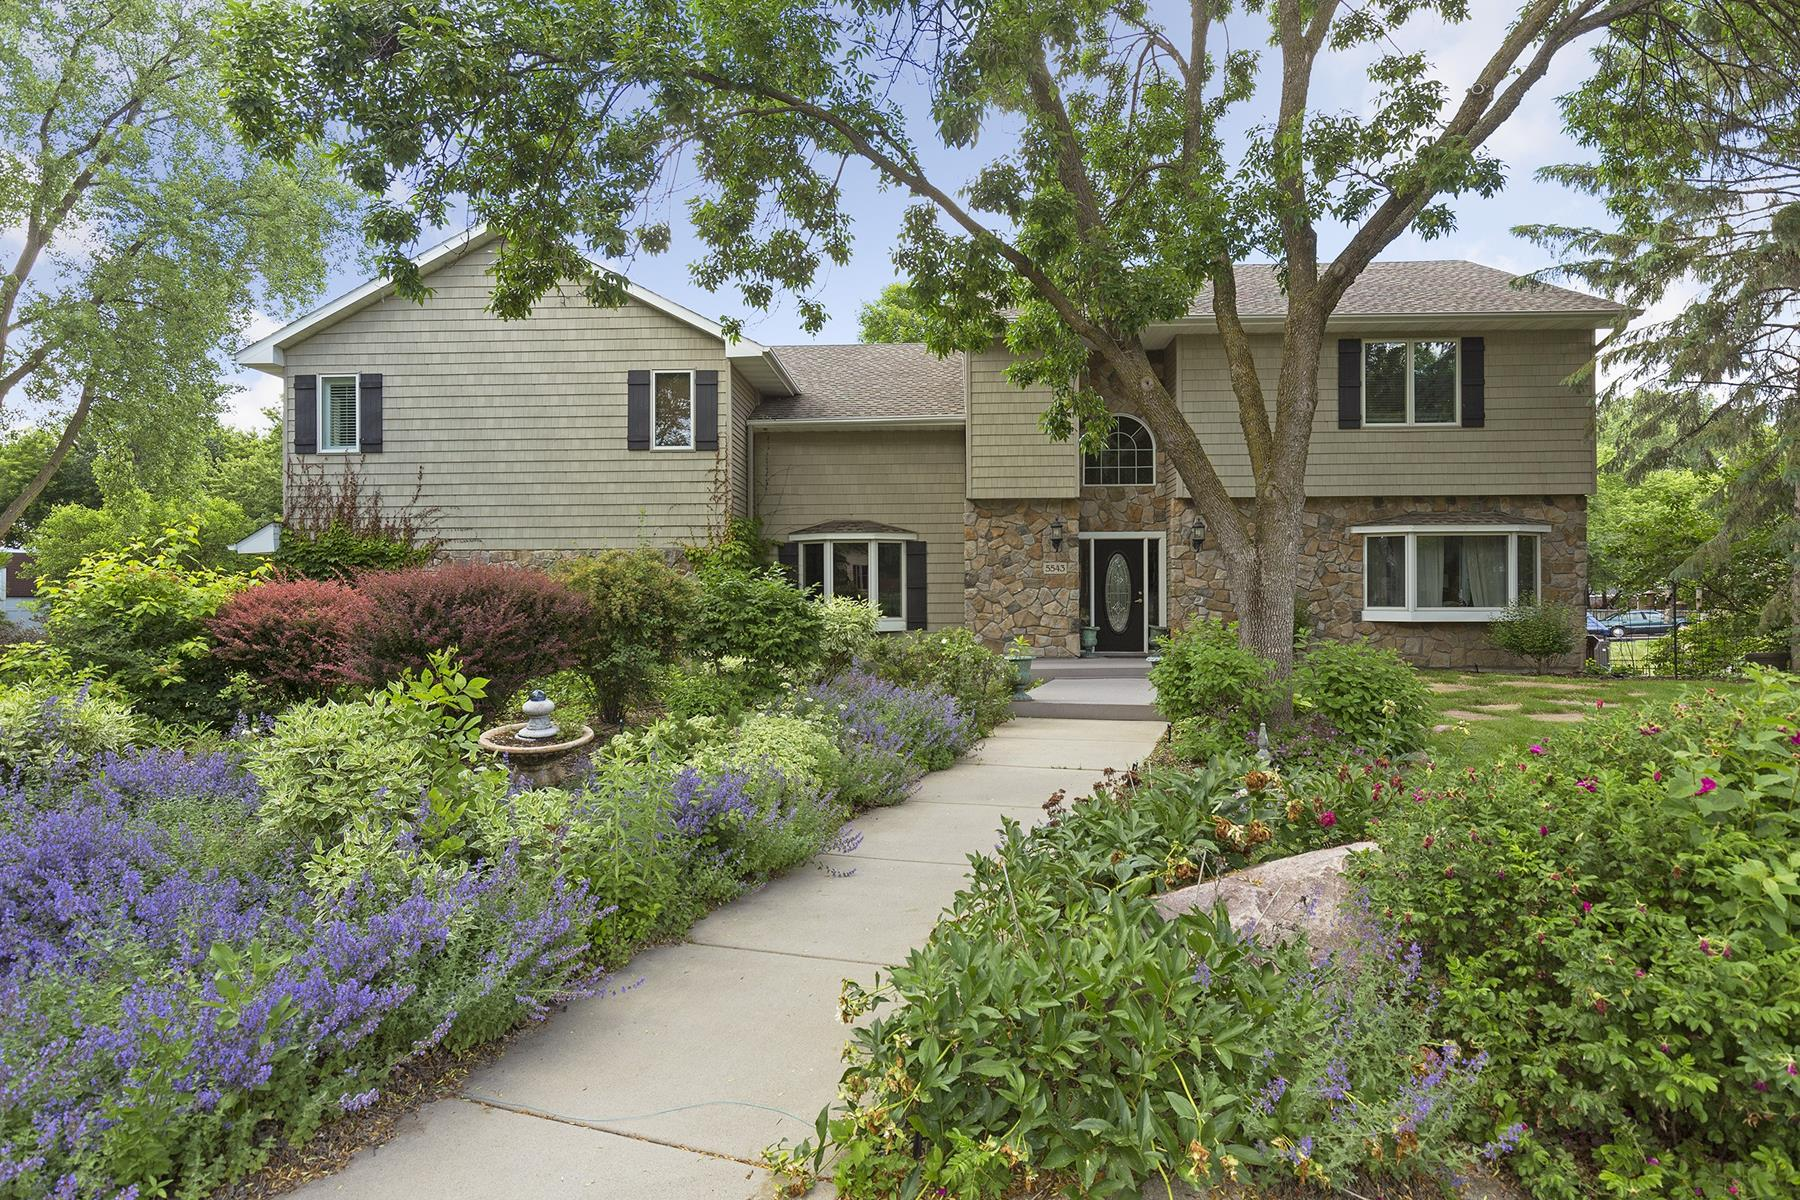 Single Family Home for Sale at 5543 Malibu Drive Edina, Minnesota 55436 United States